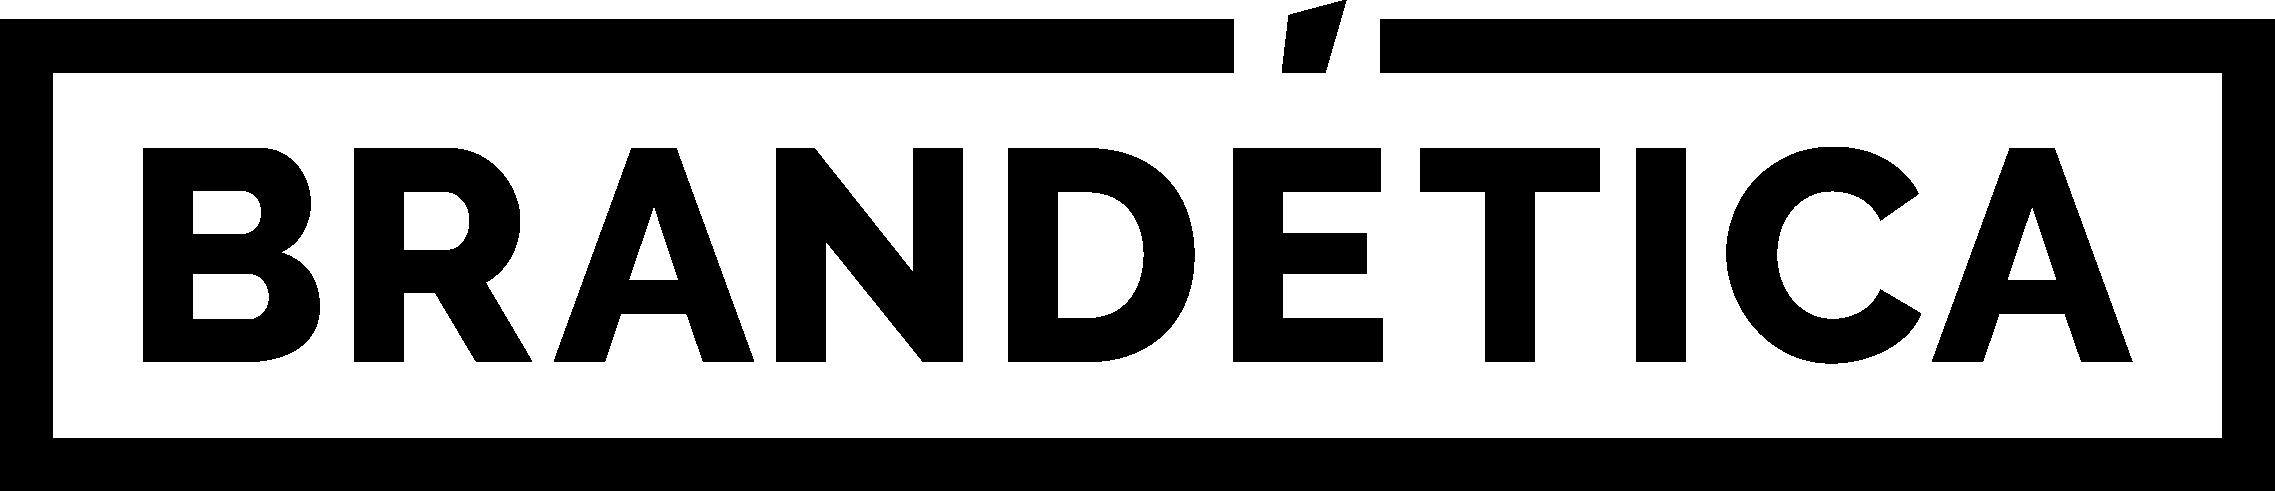 BRANDÉTICA